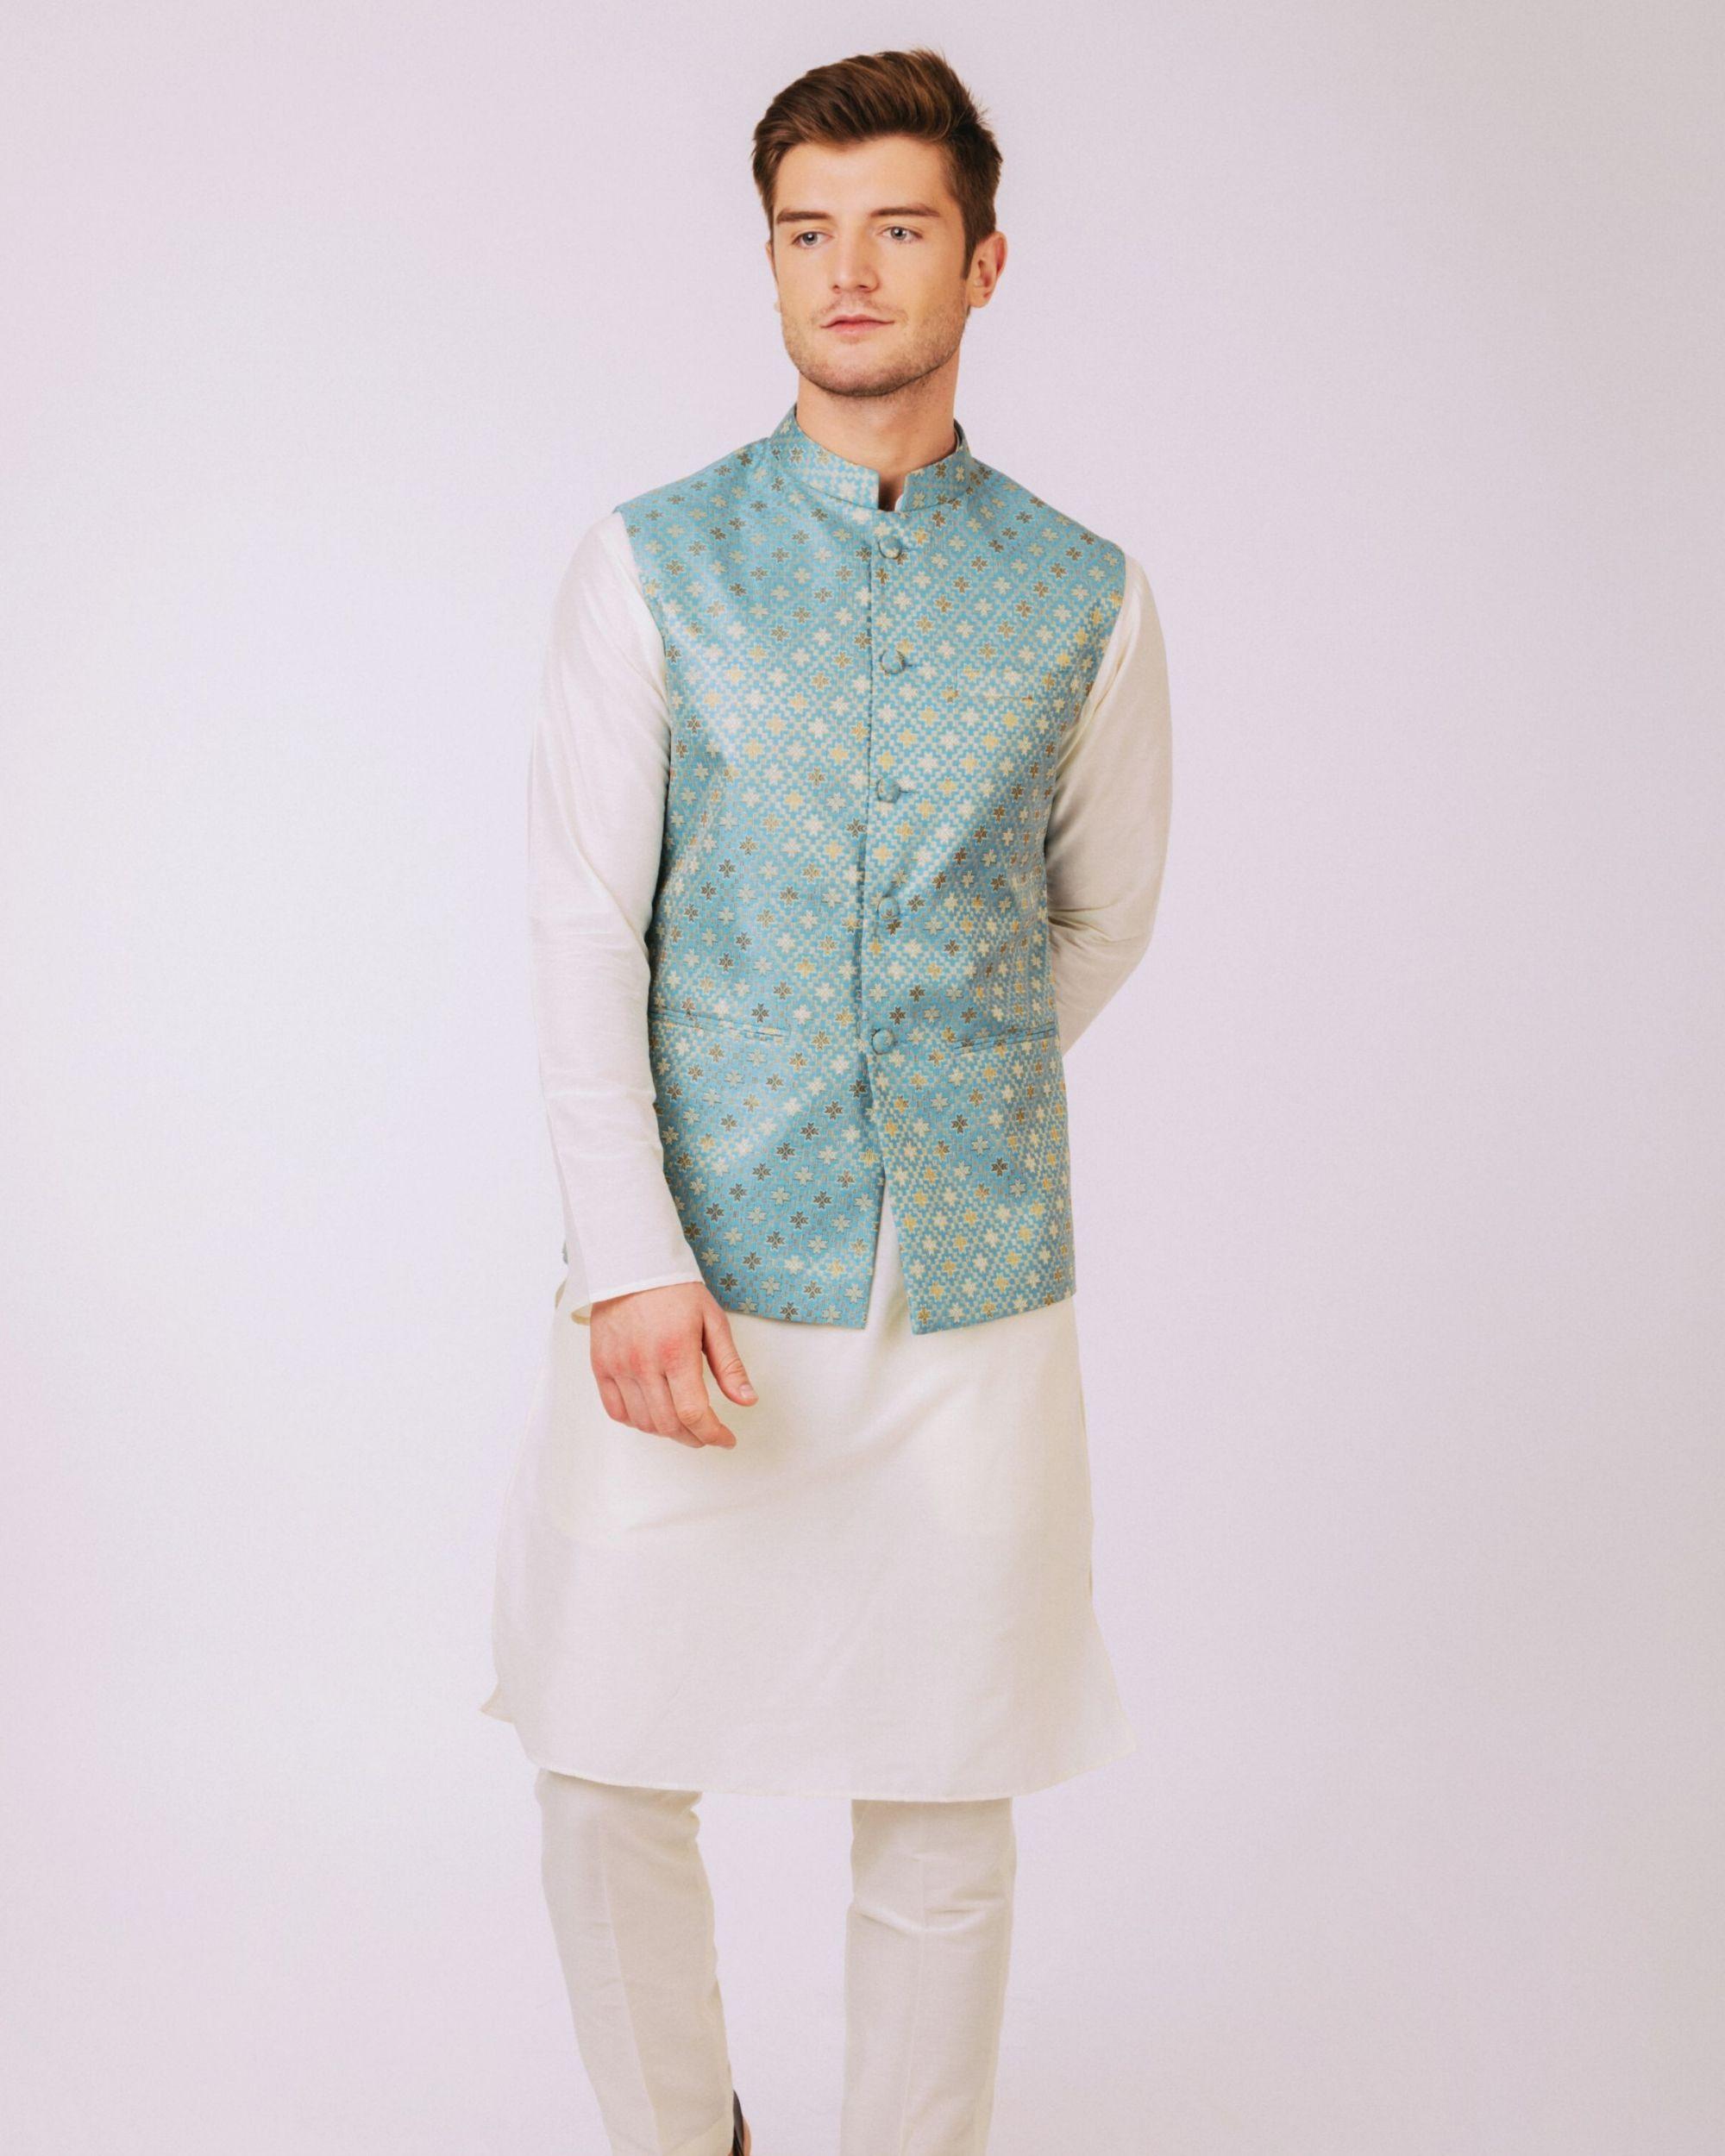 Aqua blue floral nehru jacket